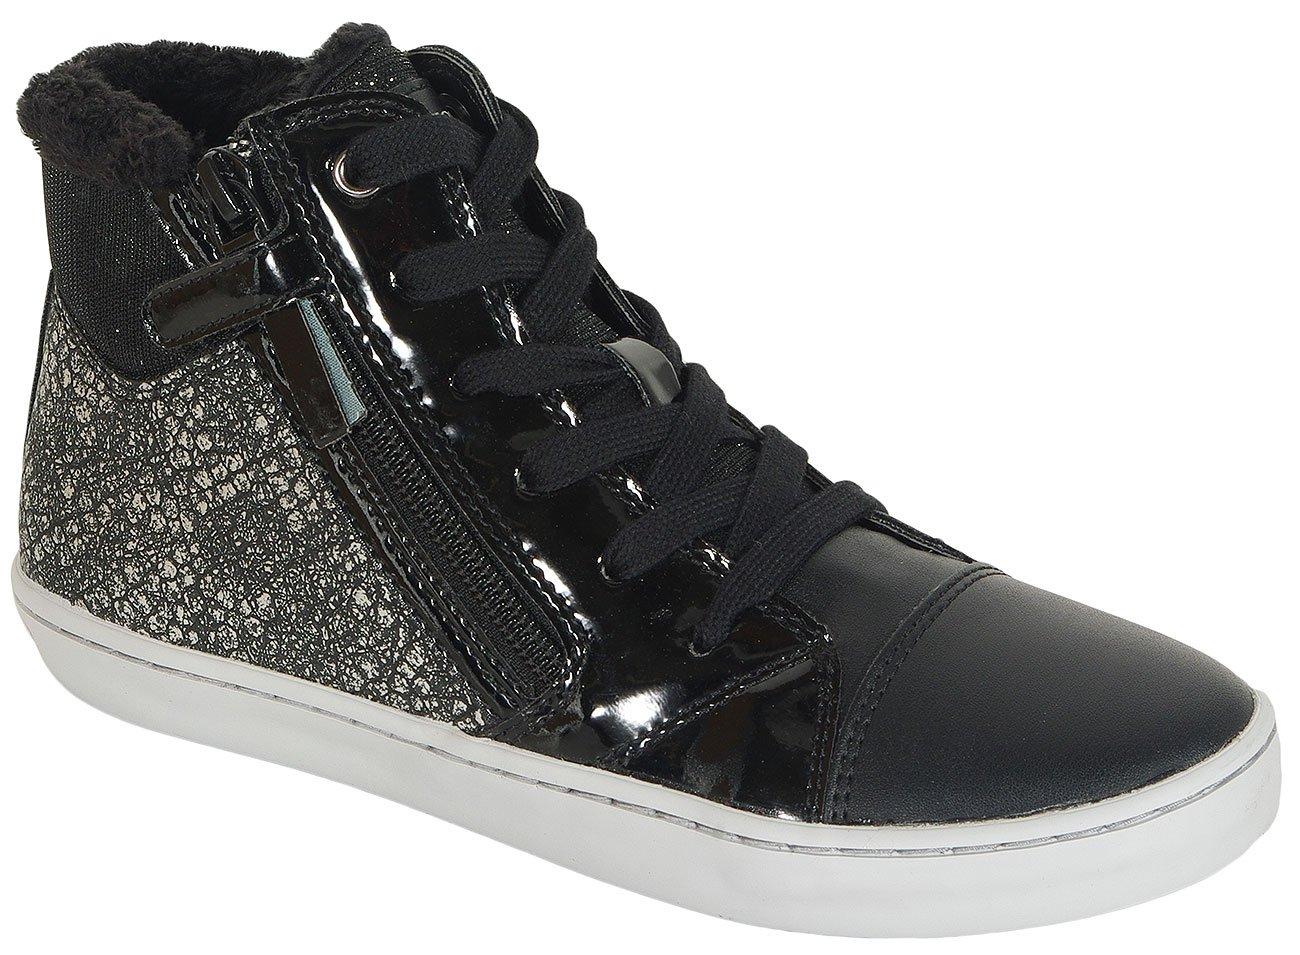 GEOX Gisli B sneakers GBK black